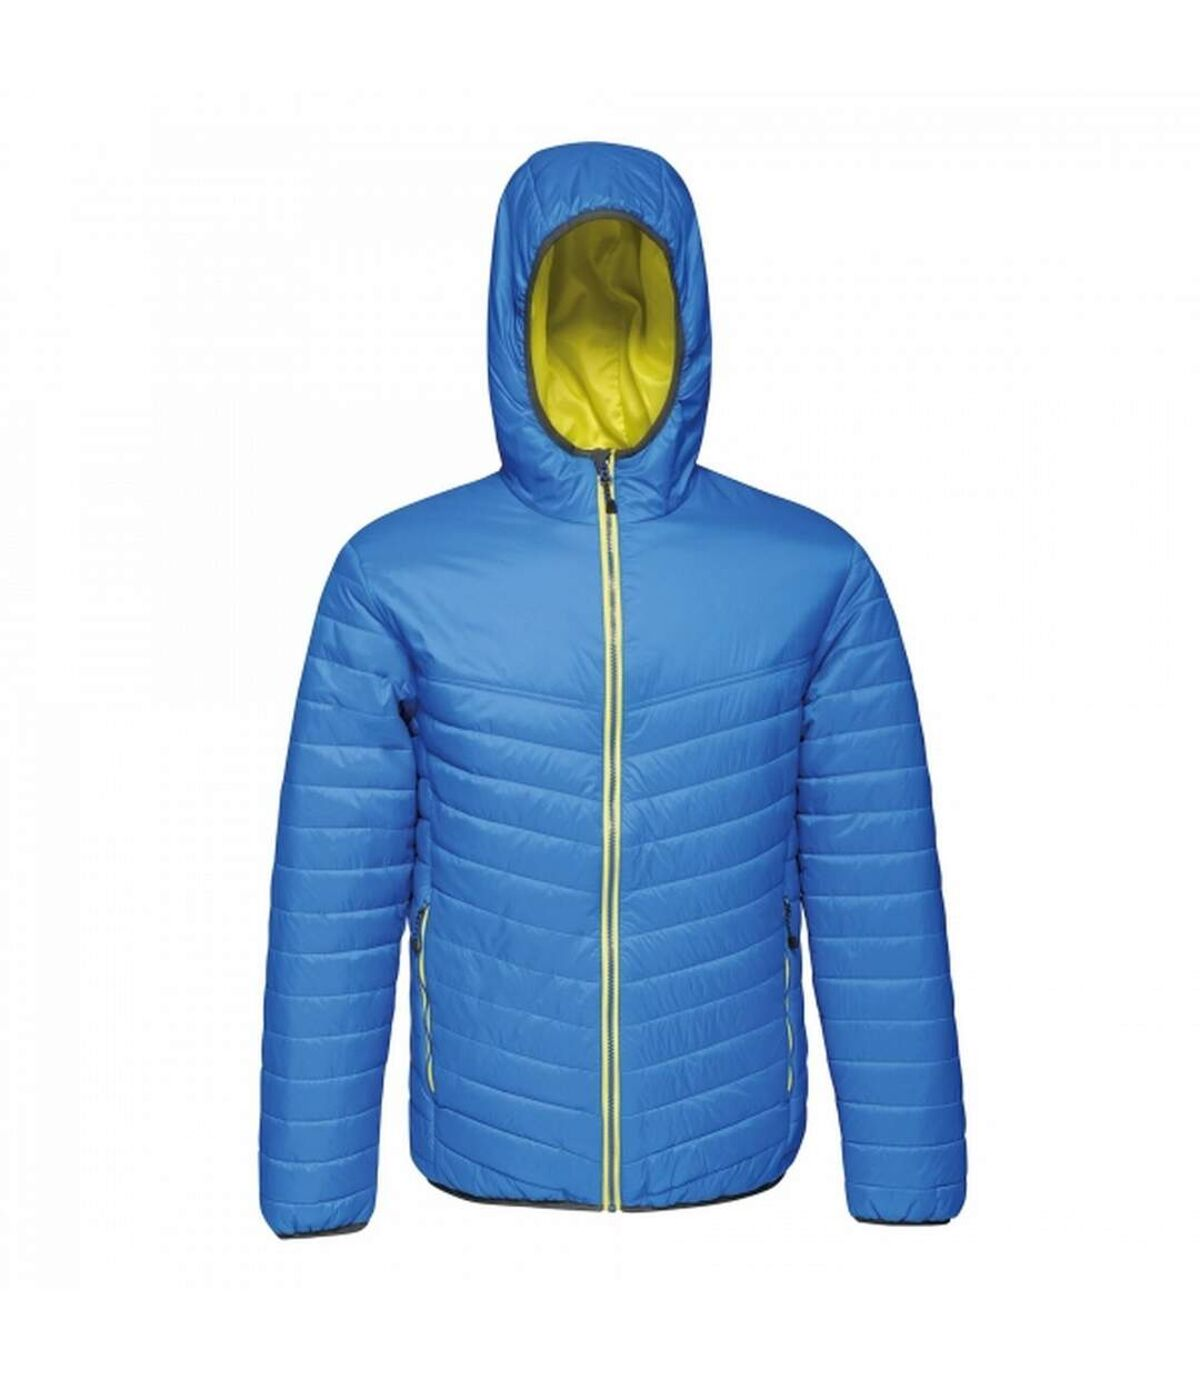 Regatta Mens Acadia II Hooded Jacket (Light Blue/Lemon Yellow) - UTRG3745